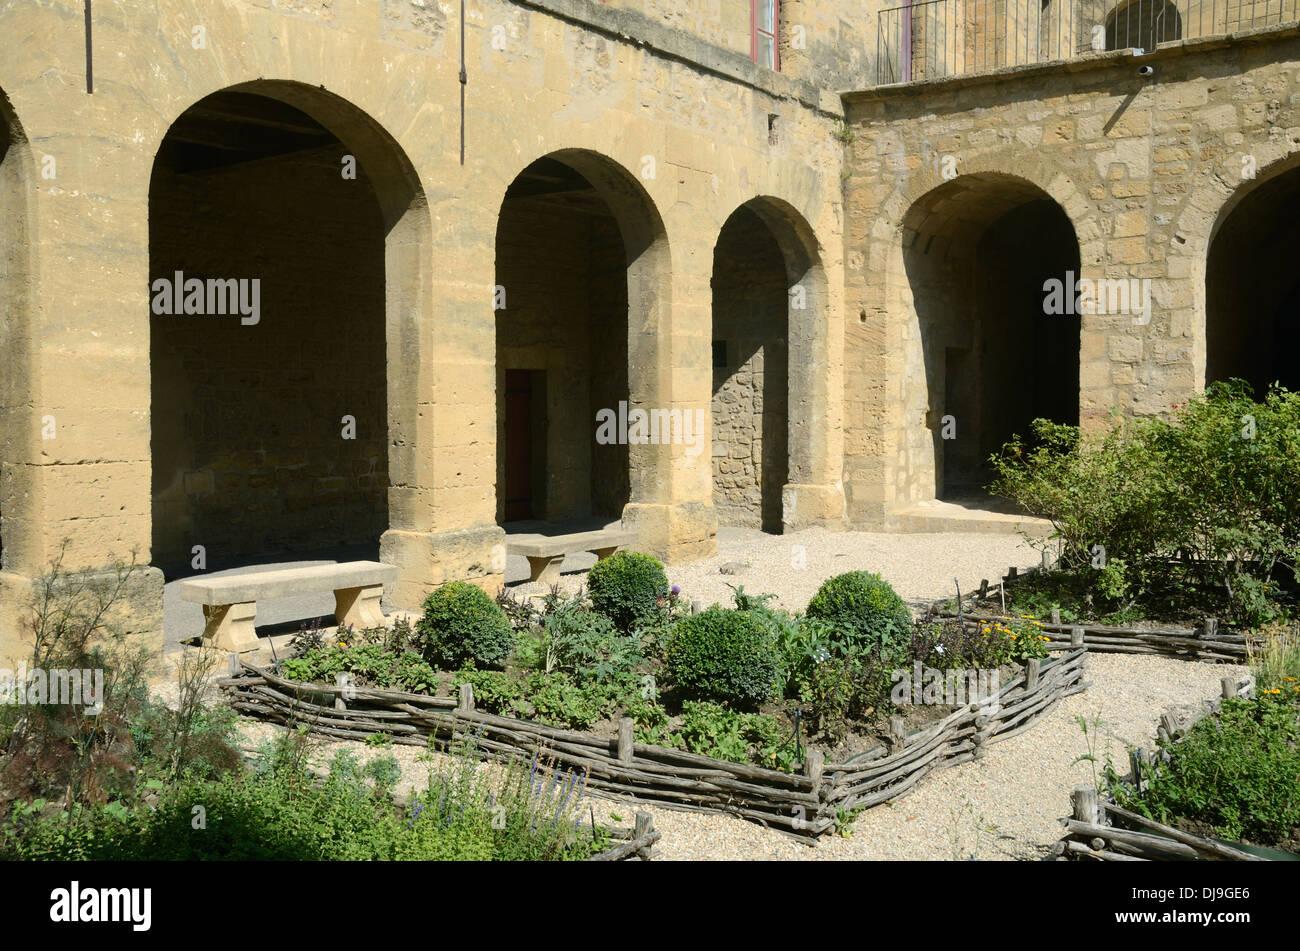 Medieval garden and courtyard of ch teau de l 39 emp ri stock photo royalty free image 62905422 - Chateau salon de provence ...